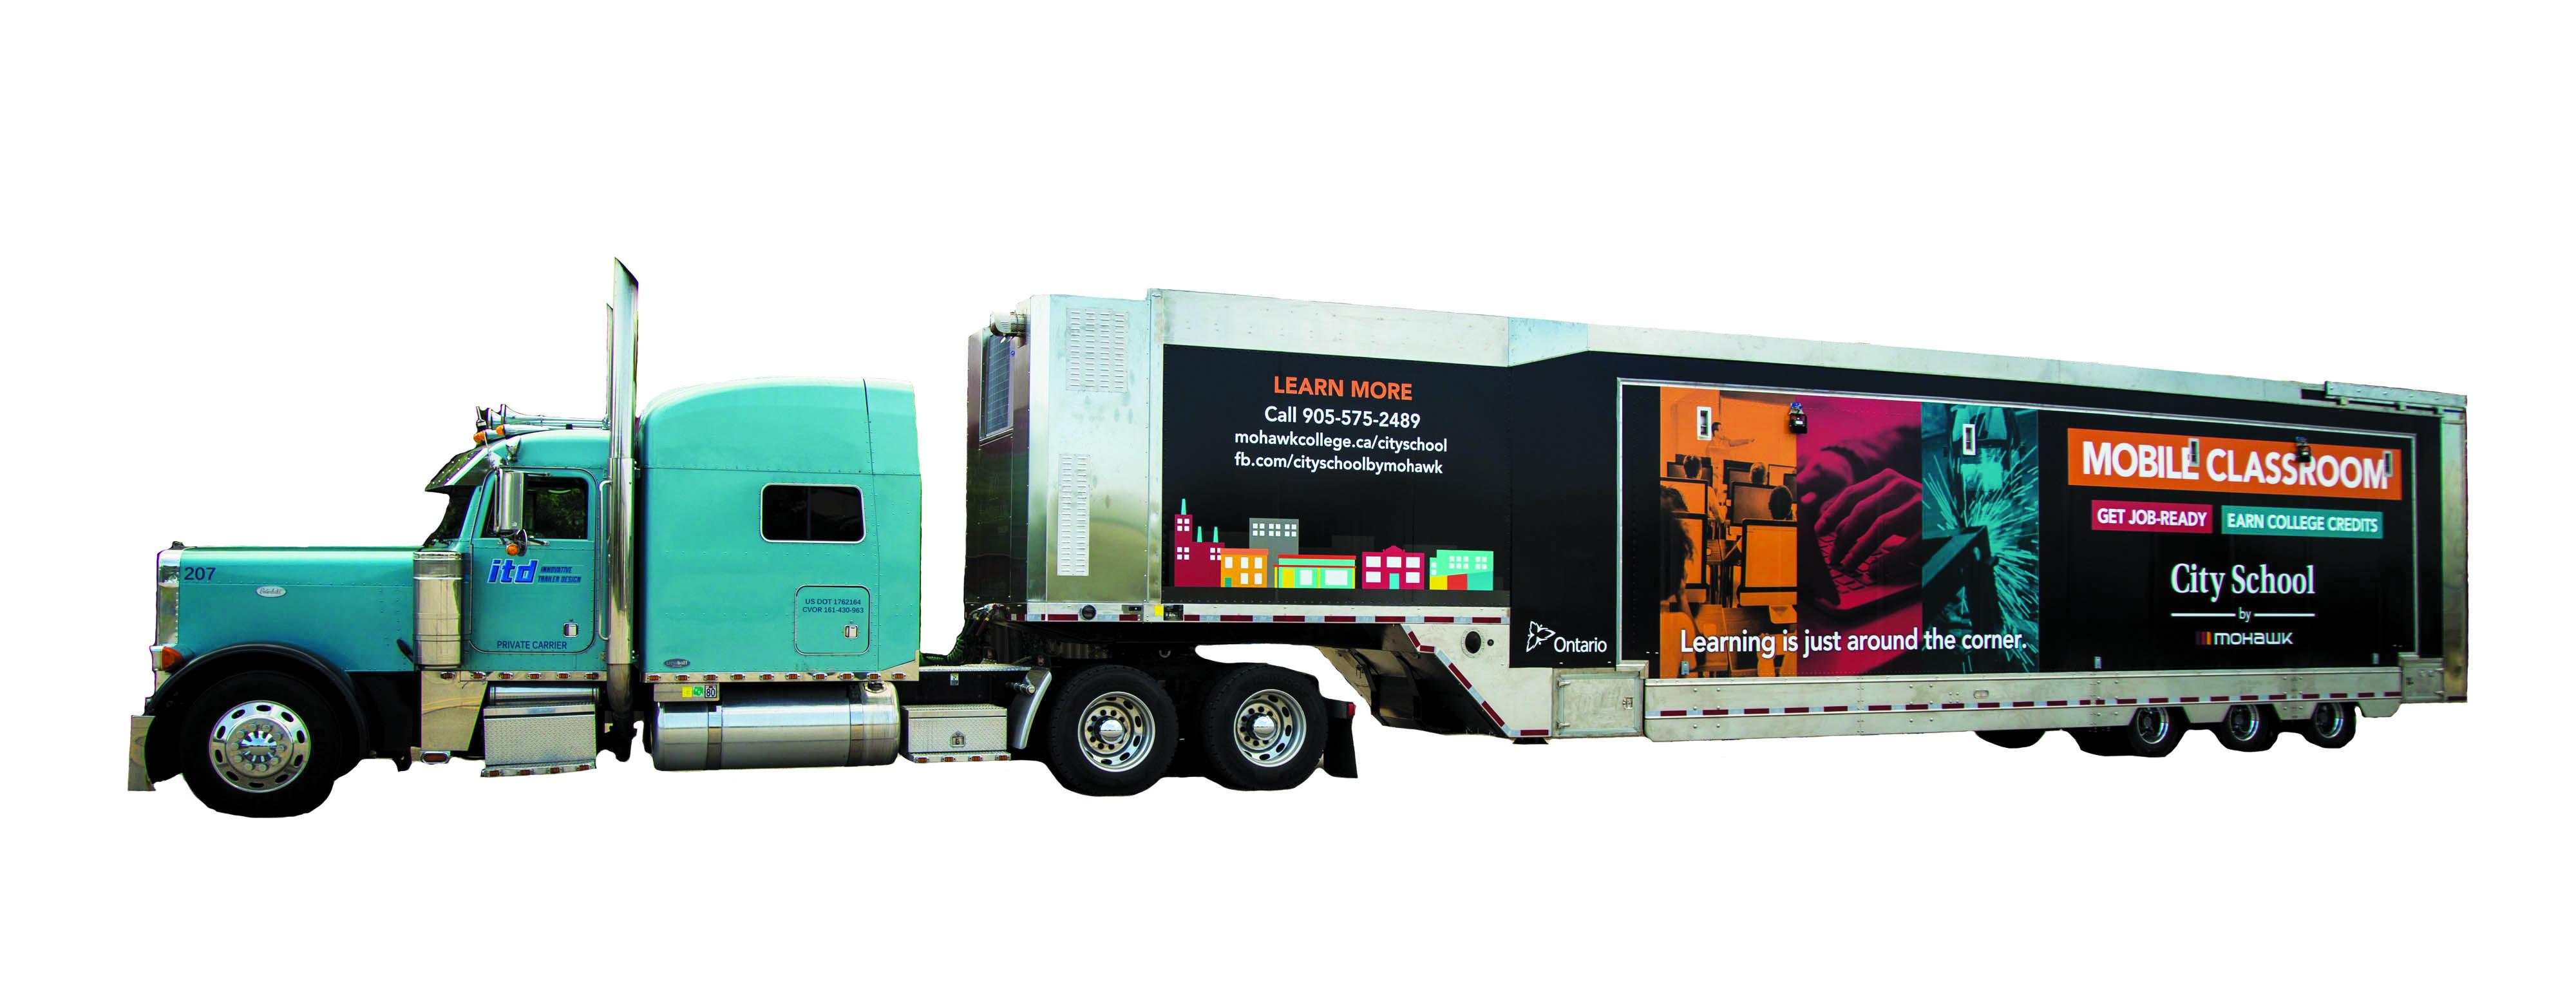 Transport truck pulling portable classroom.